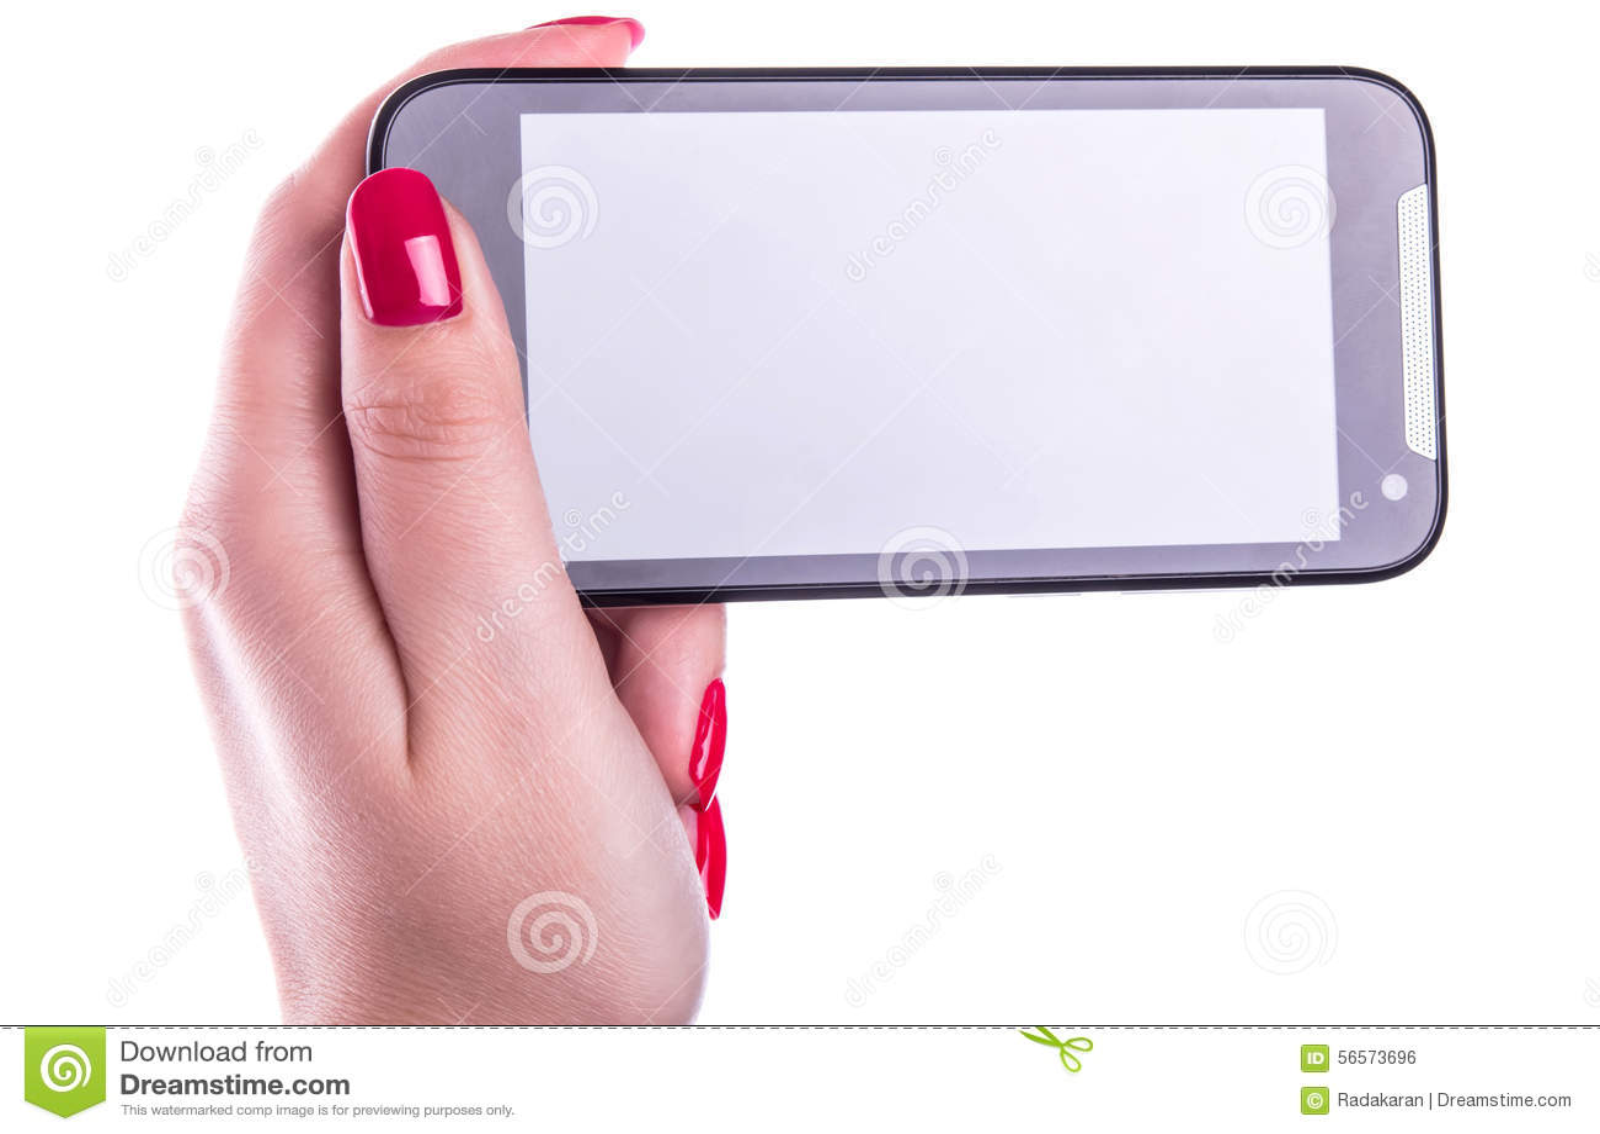 Download Τηλέφωνο κυττάρων με την οθόνη επαφής στο θηλυκό χέρι με τα γαλλικά καρφιά μανικιούρ στο λευκό Στοκ Εικόνες - εικόνα από cellphone, απομονωμένος: 56573696